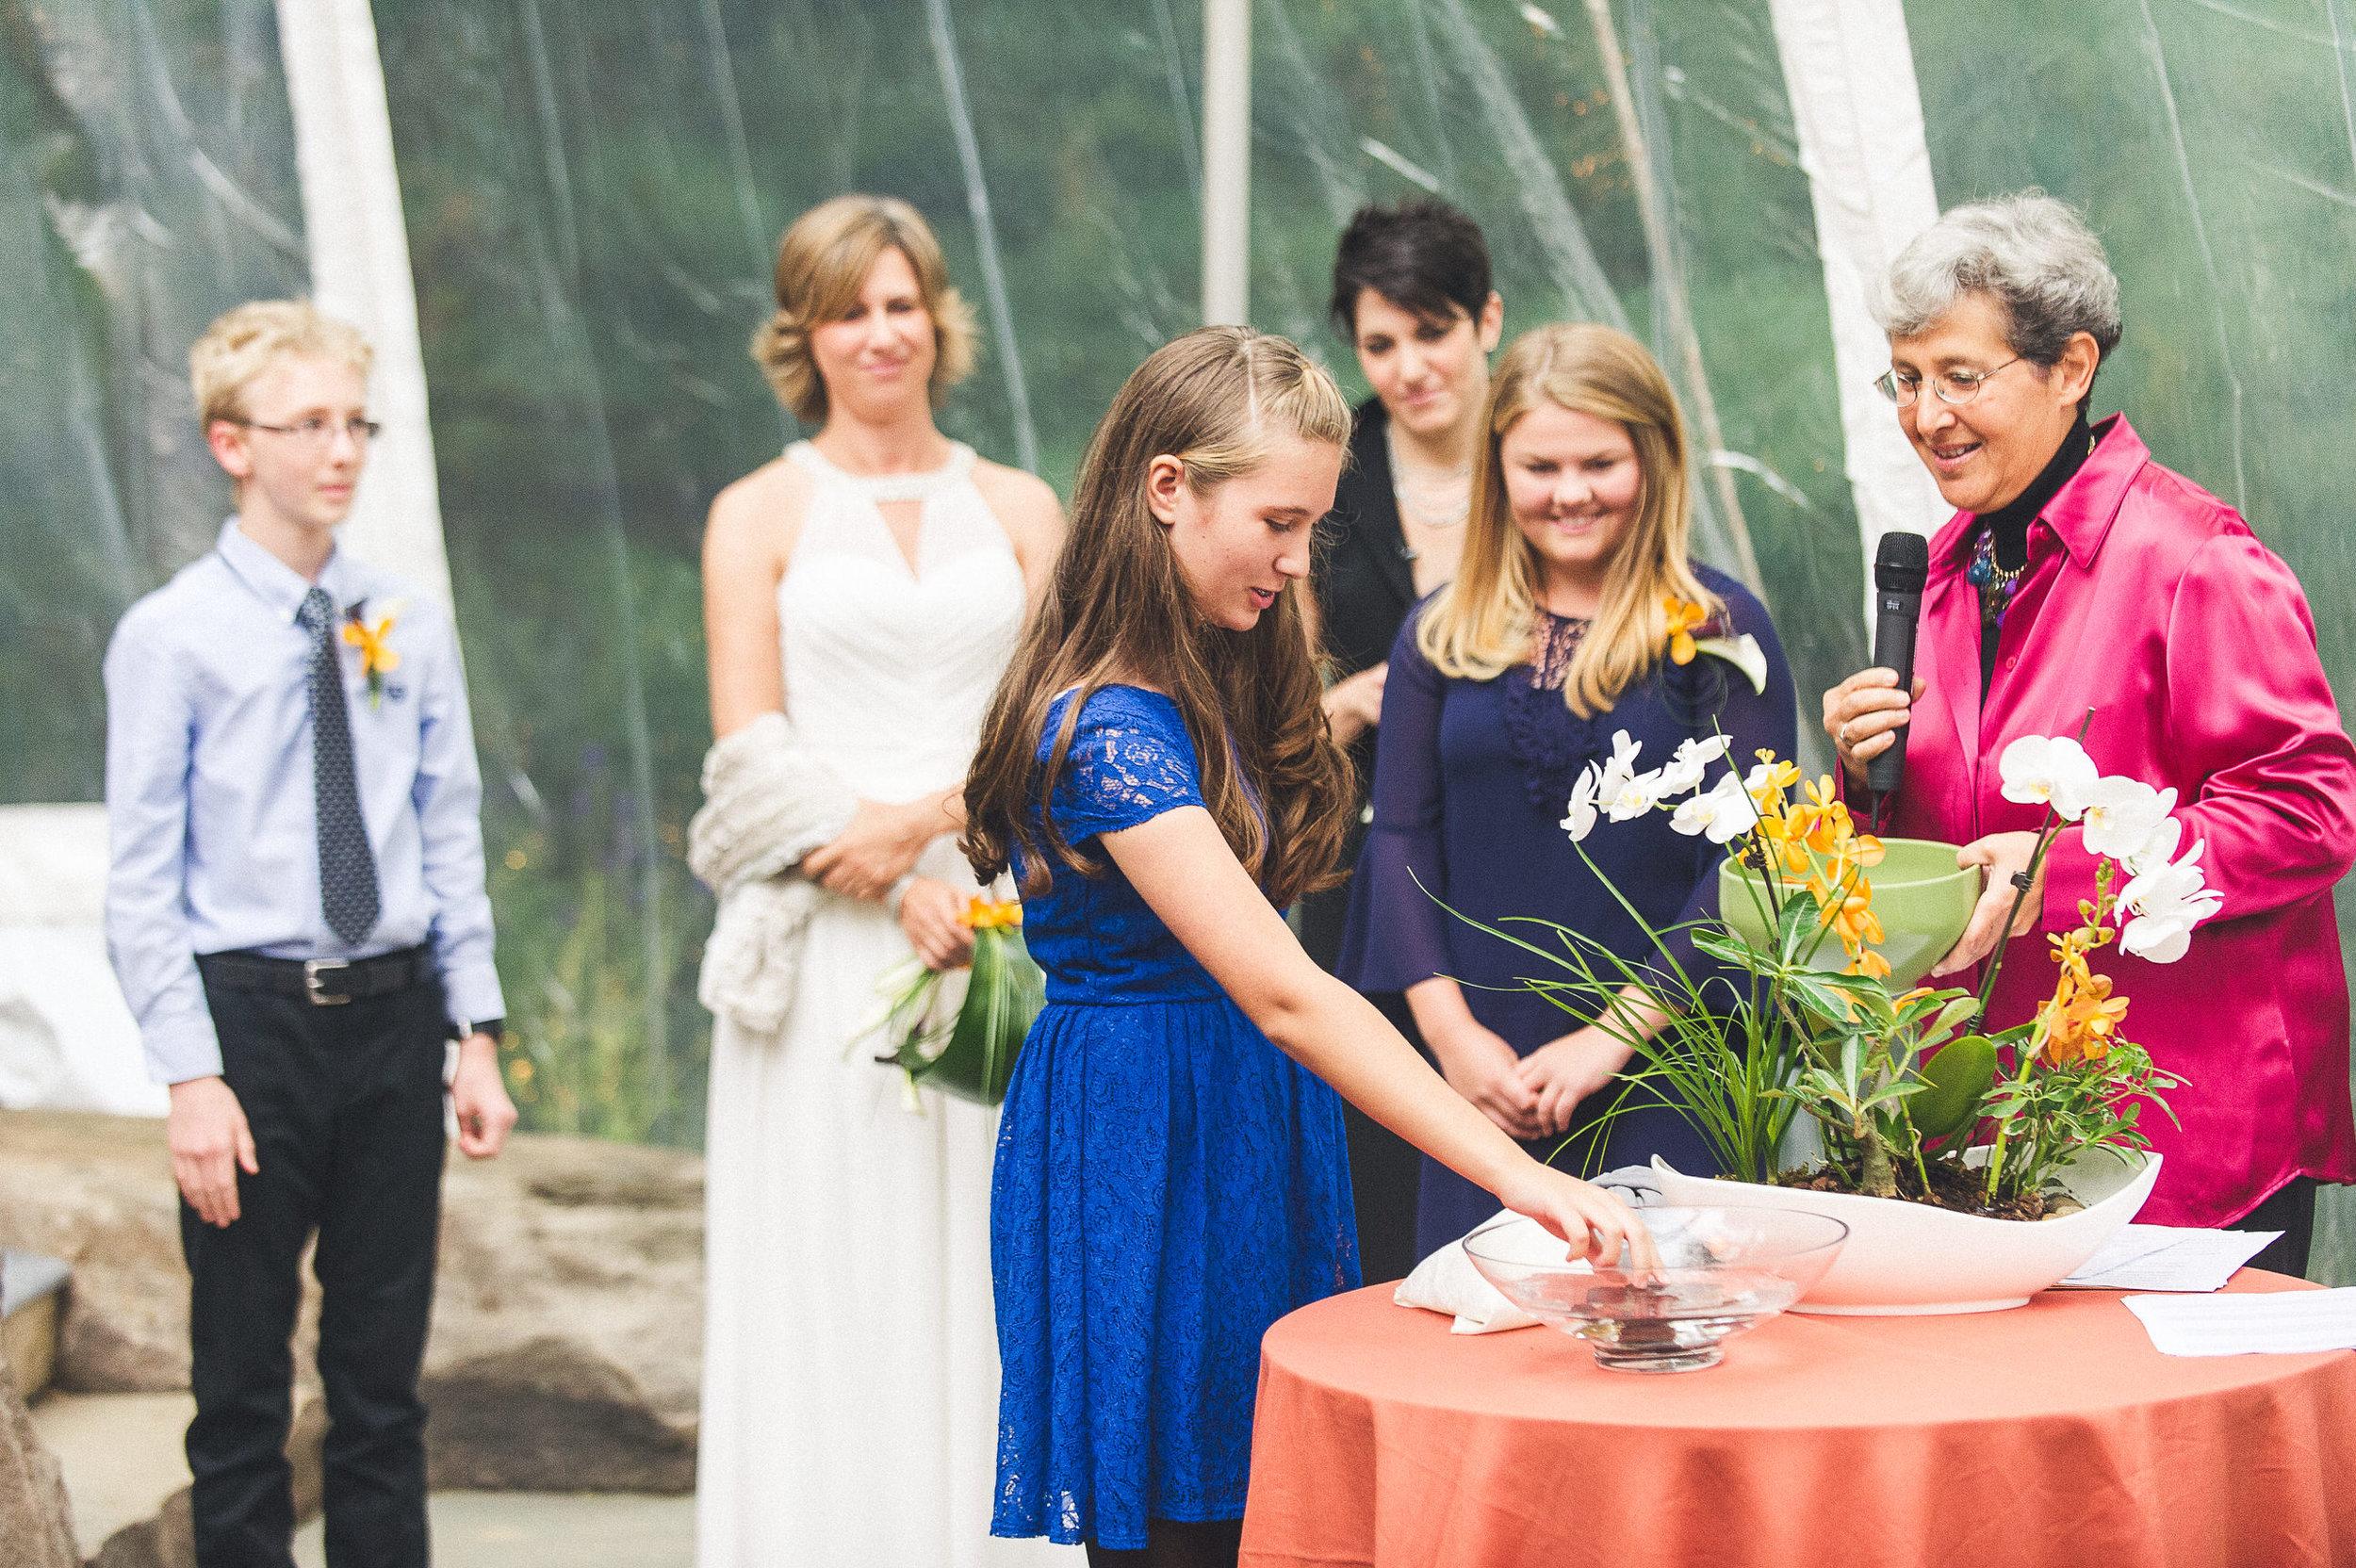 15 Philadelphia At Home Wedding Family Remembrance Stone Ceremony.jpg